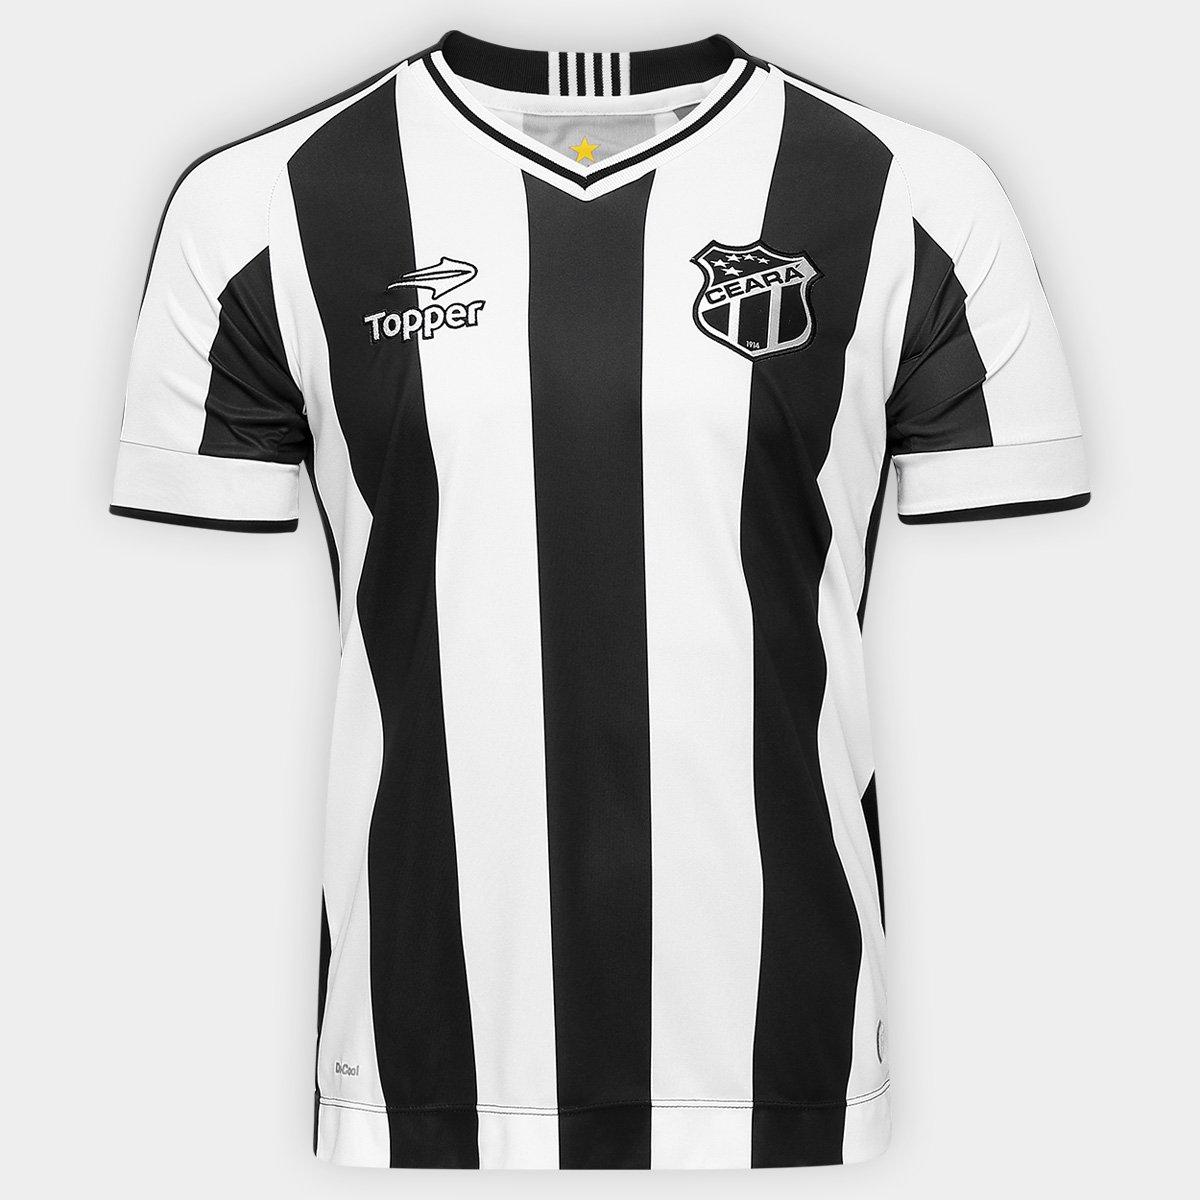 Camisa Ceará I 2016 nº 10 Torcedor Topper Masculina - Compre Agora ... 89c5a6c7b1c9f